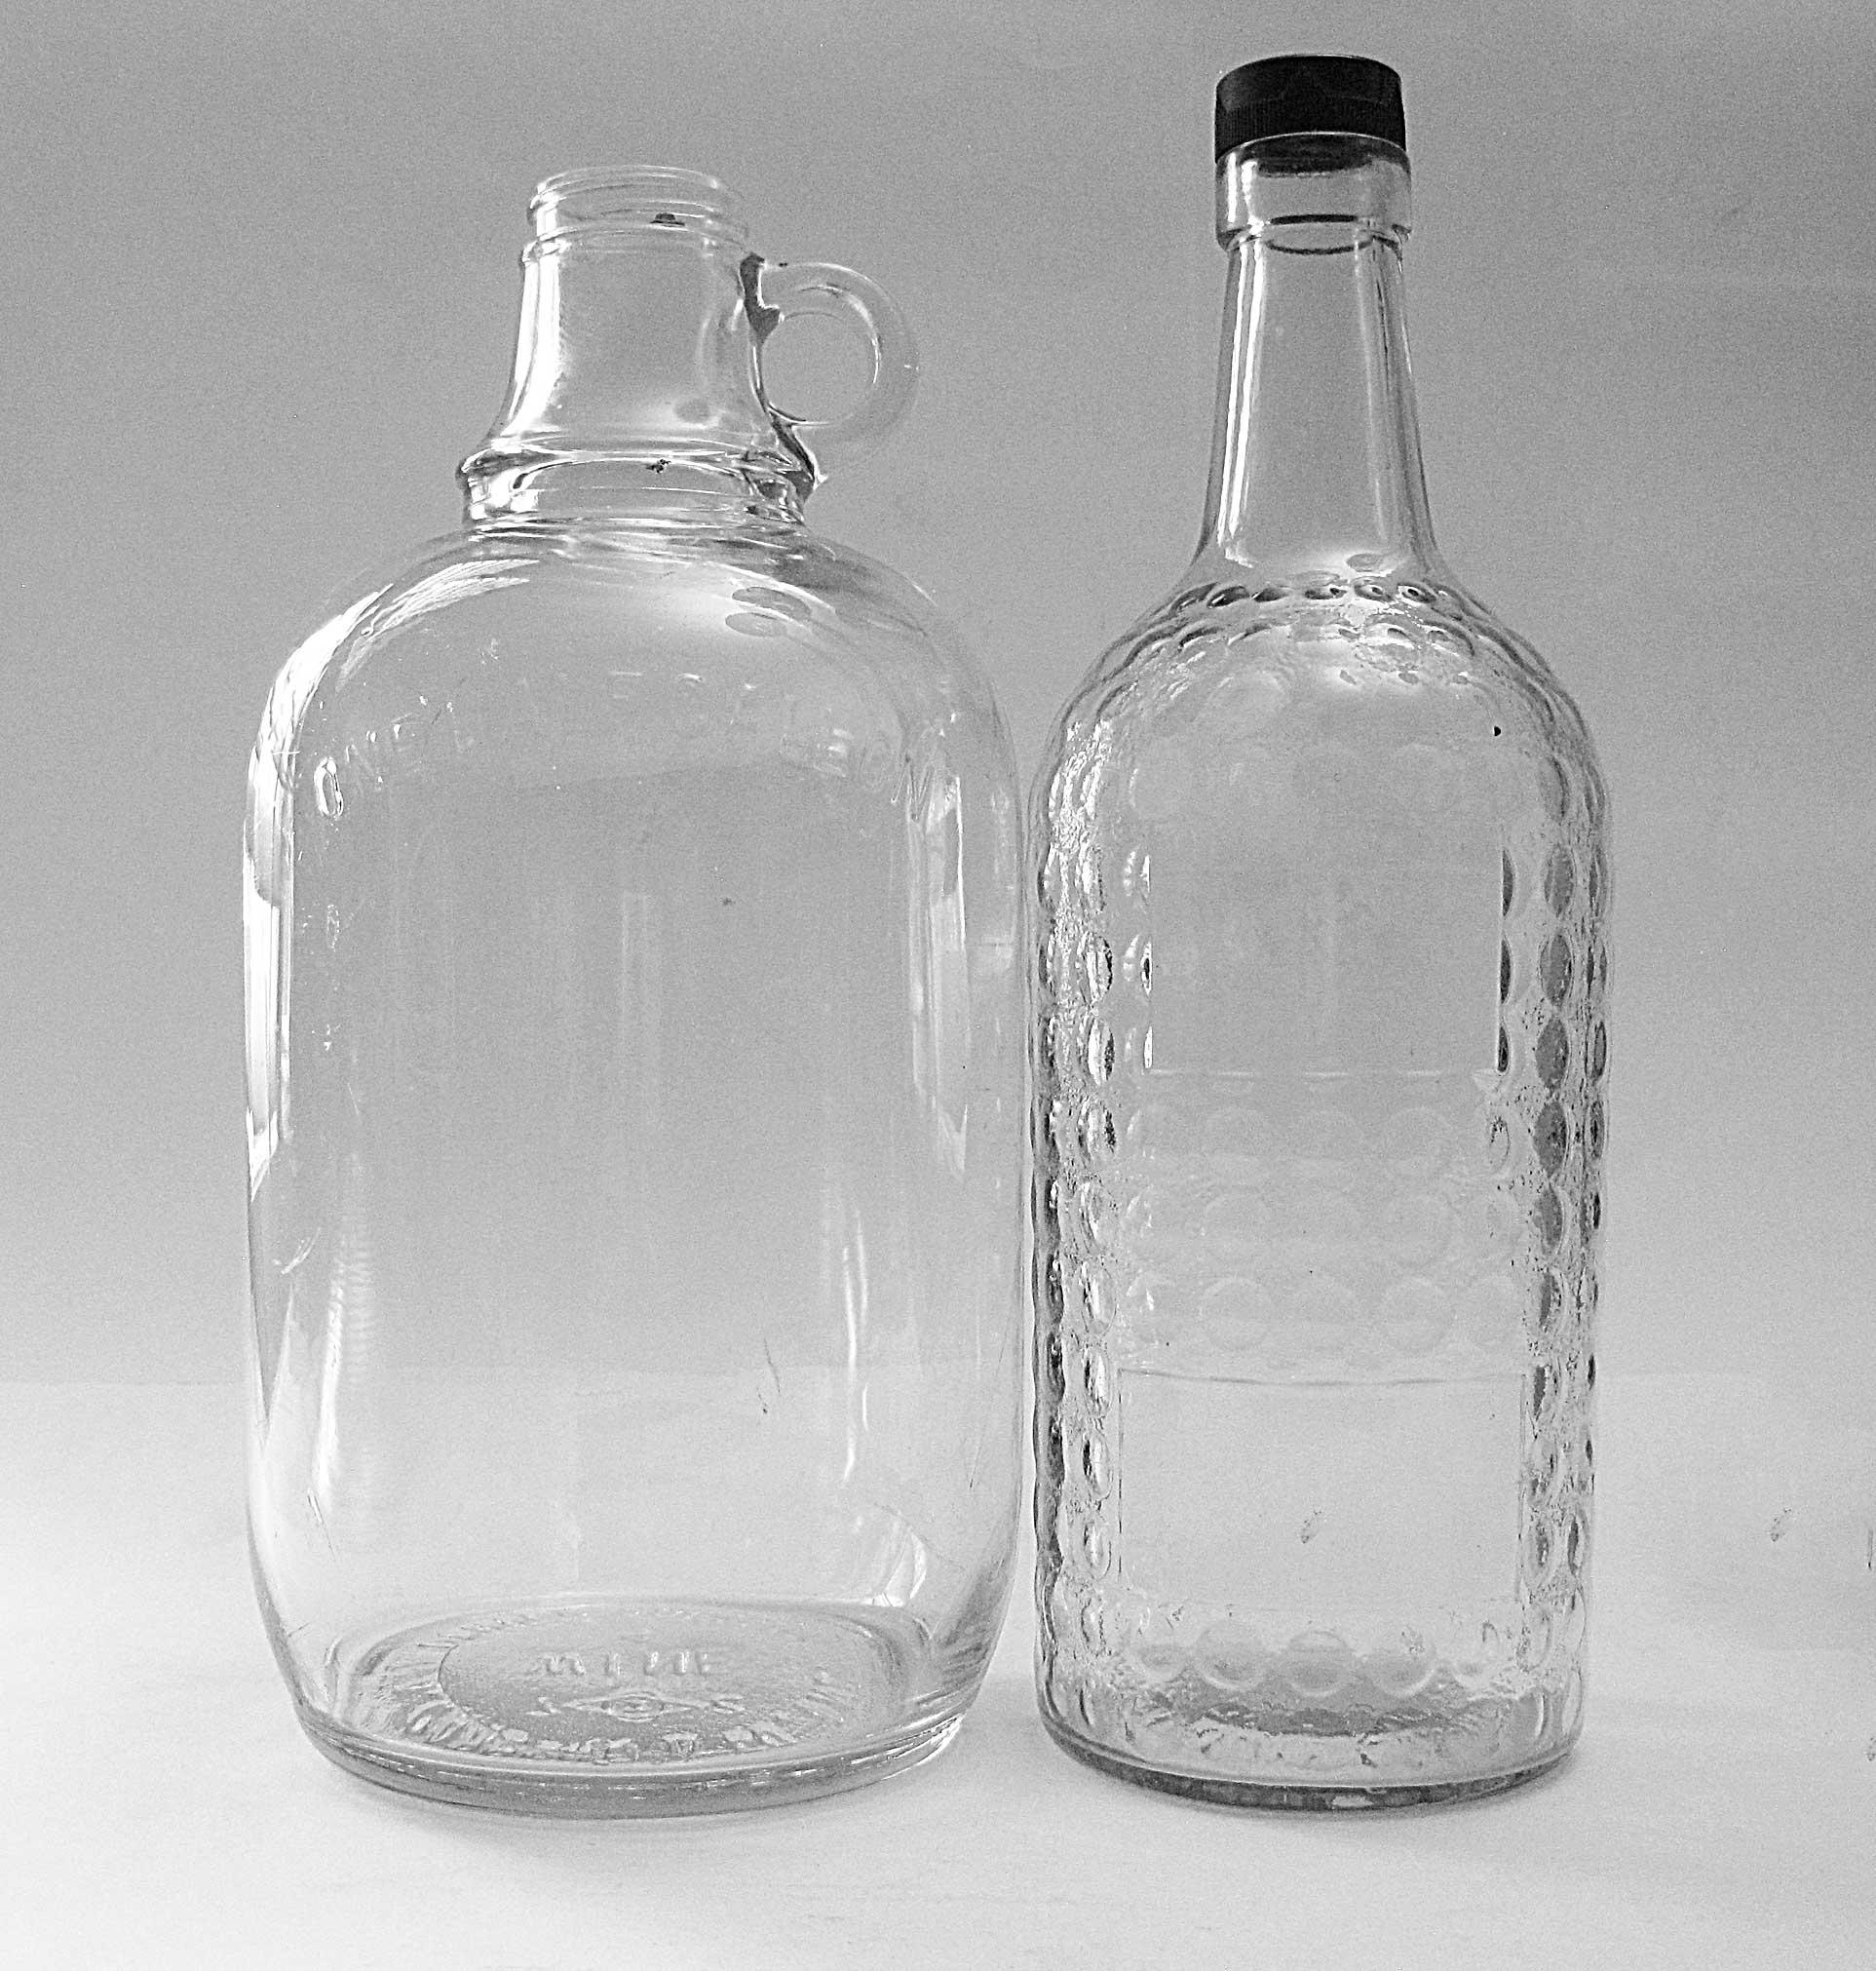 carbone-wine-d-sawin-bottles-redux